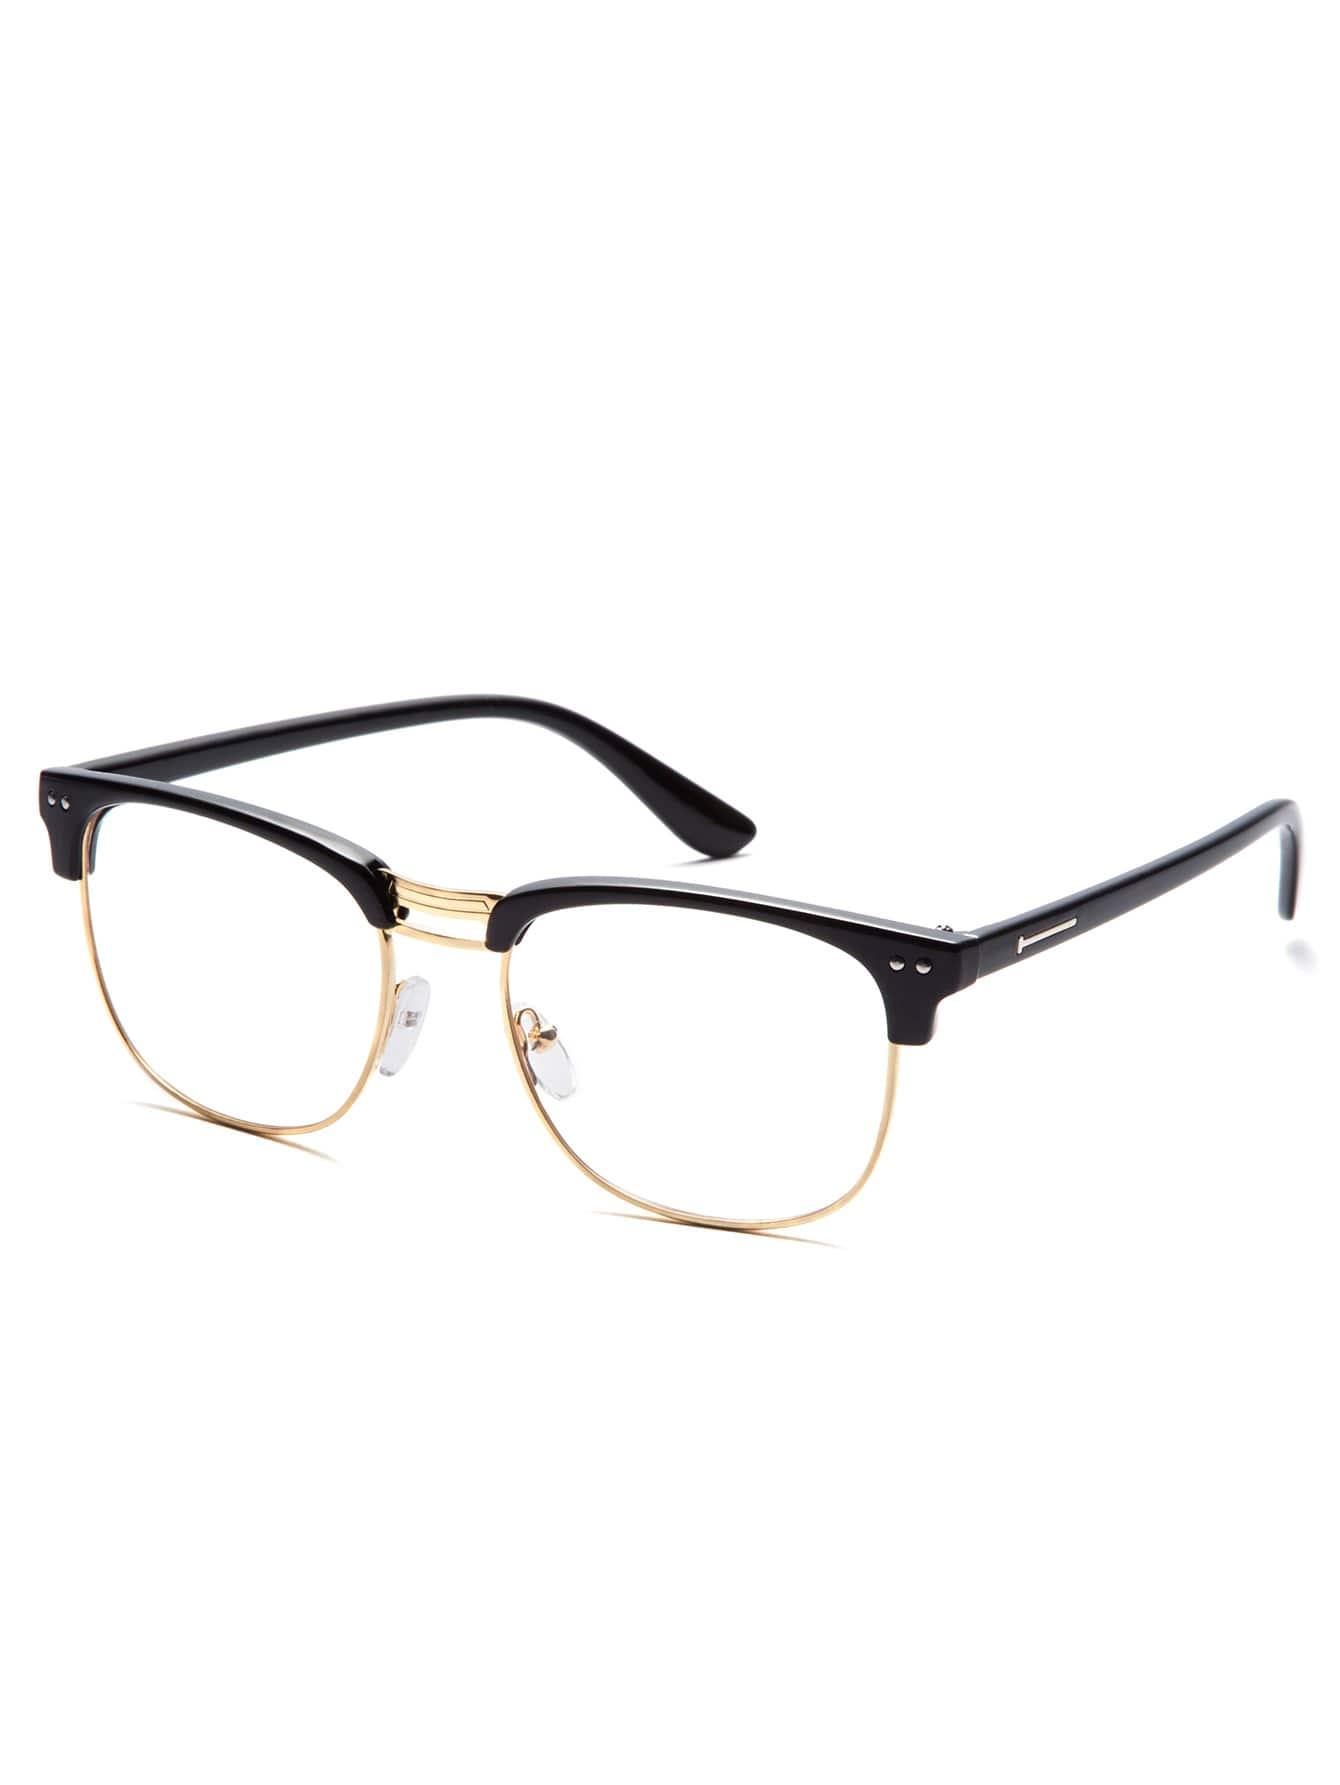 Black Open Frame Gold Trim Glasses sunglass160912310